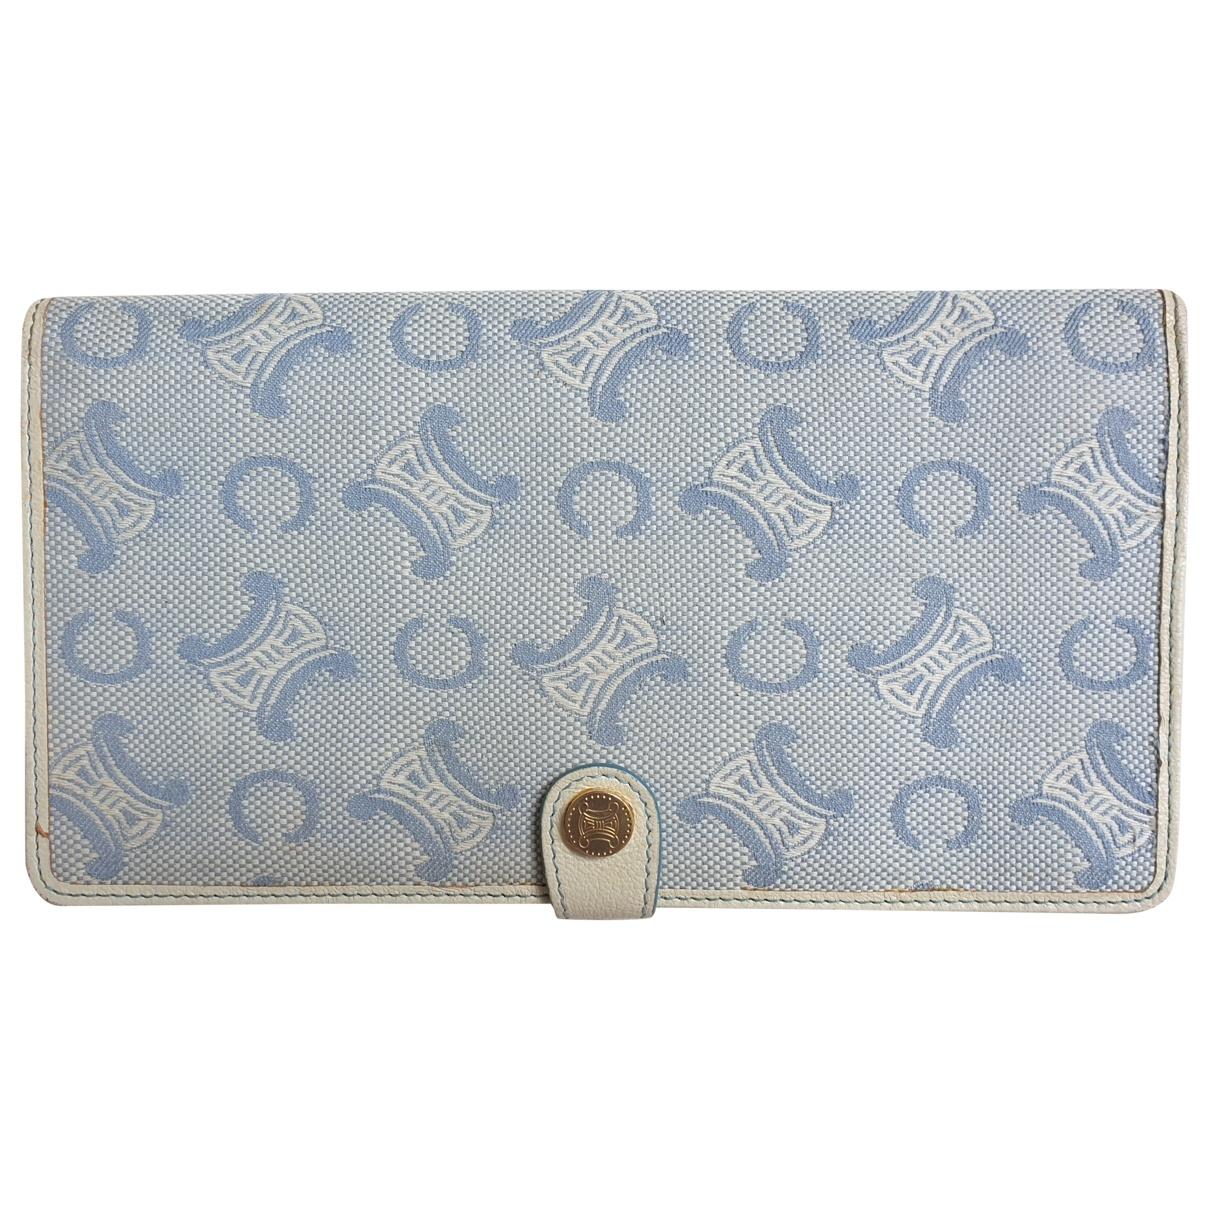 Celine \N Blue Cloth wallet for Women \N